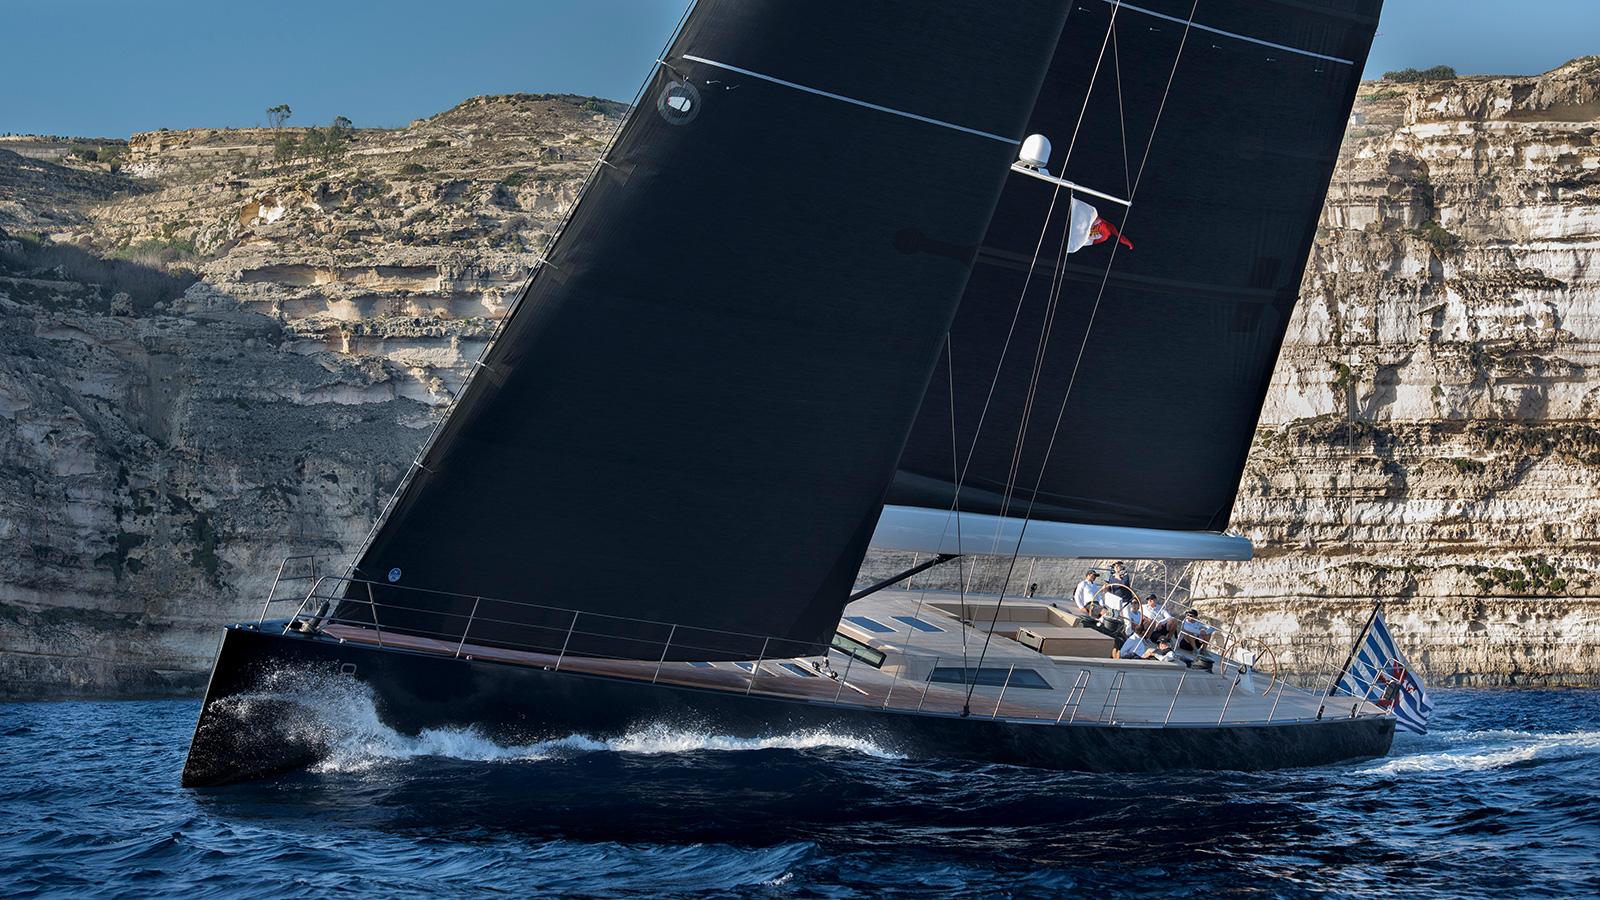 running-shot-of-the-wally-110-sailing-yacht-barong-d-credit-kurt-arrigo